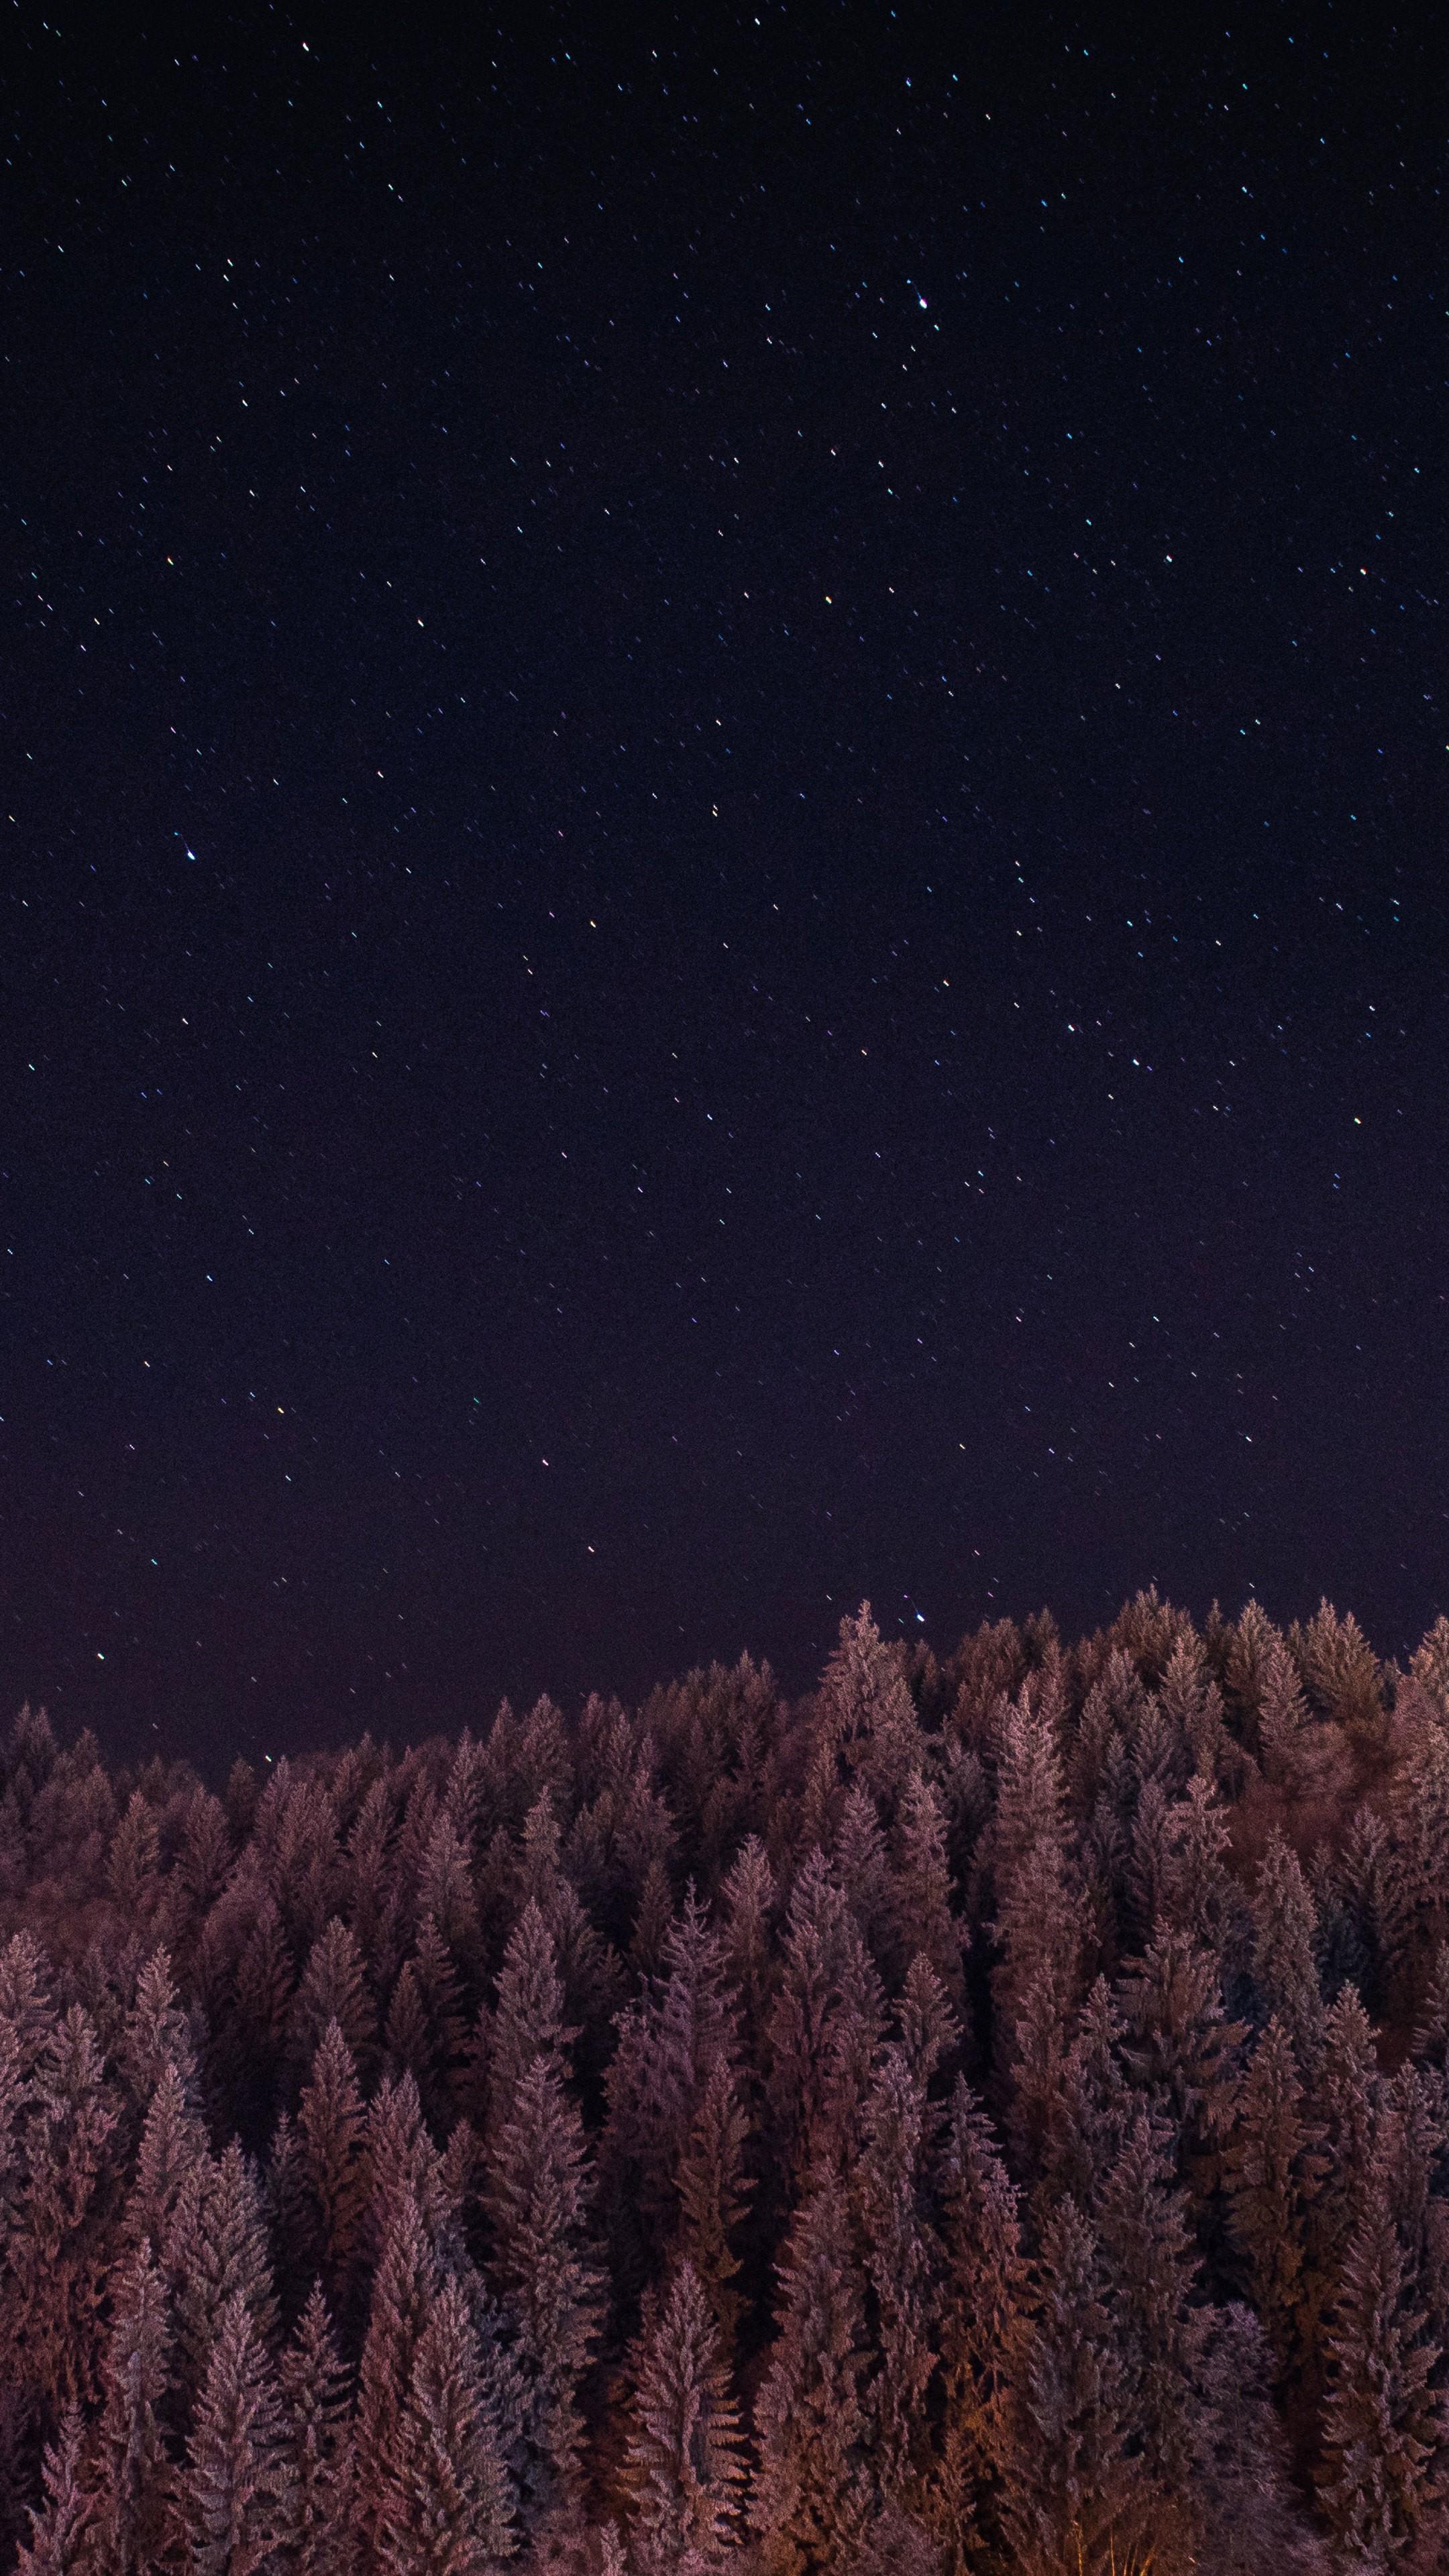 Amazing Wallpaper Night Dark - Stars-Trees-Night-Dark-Sky-Ym-Wallpaper-2160x3840  Trends.jpg